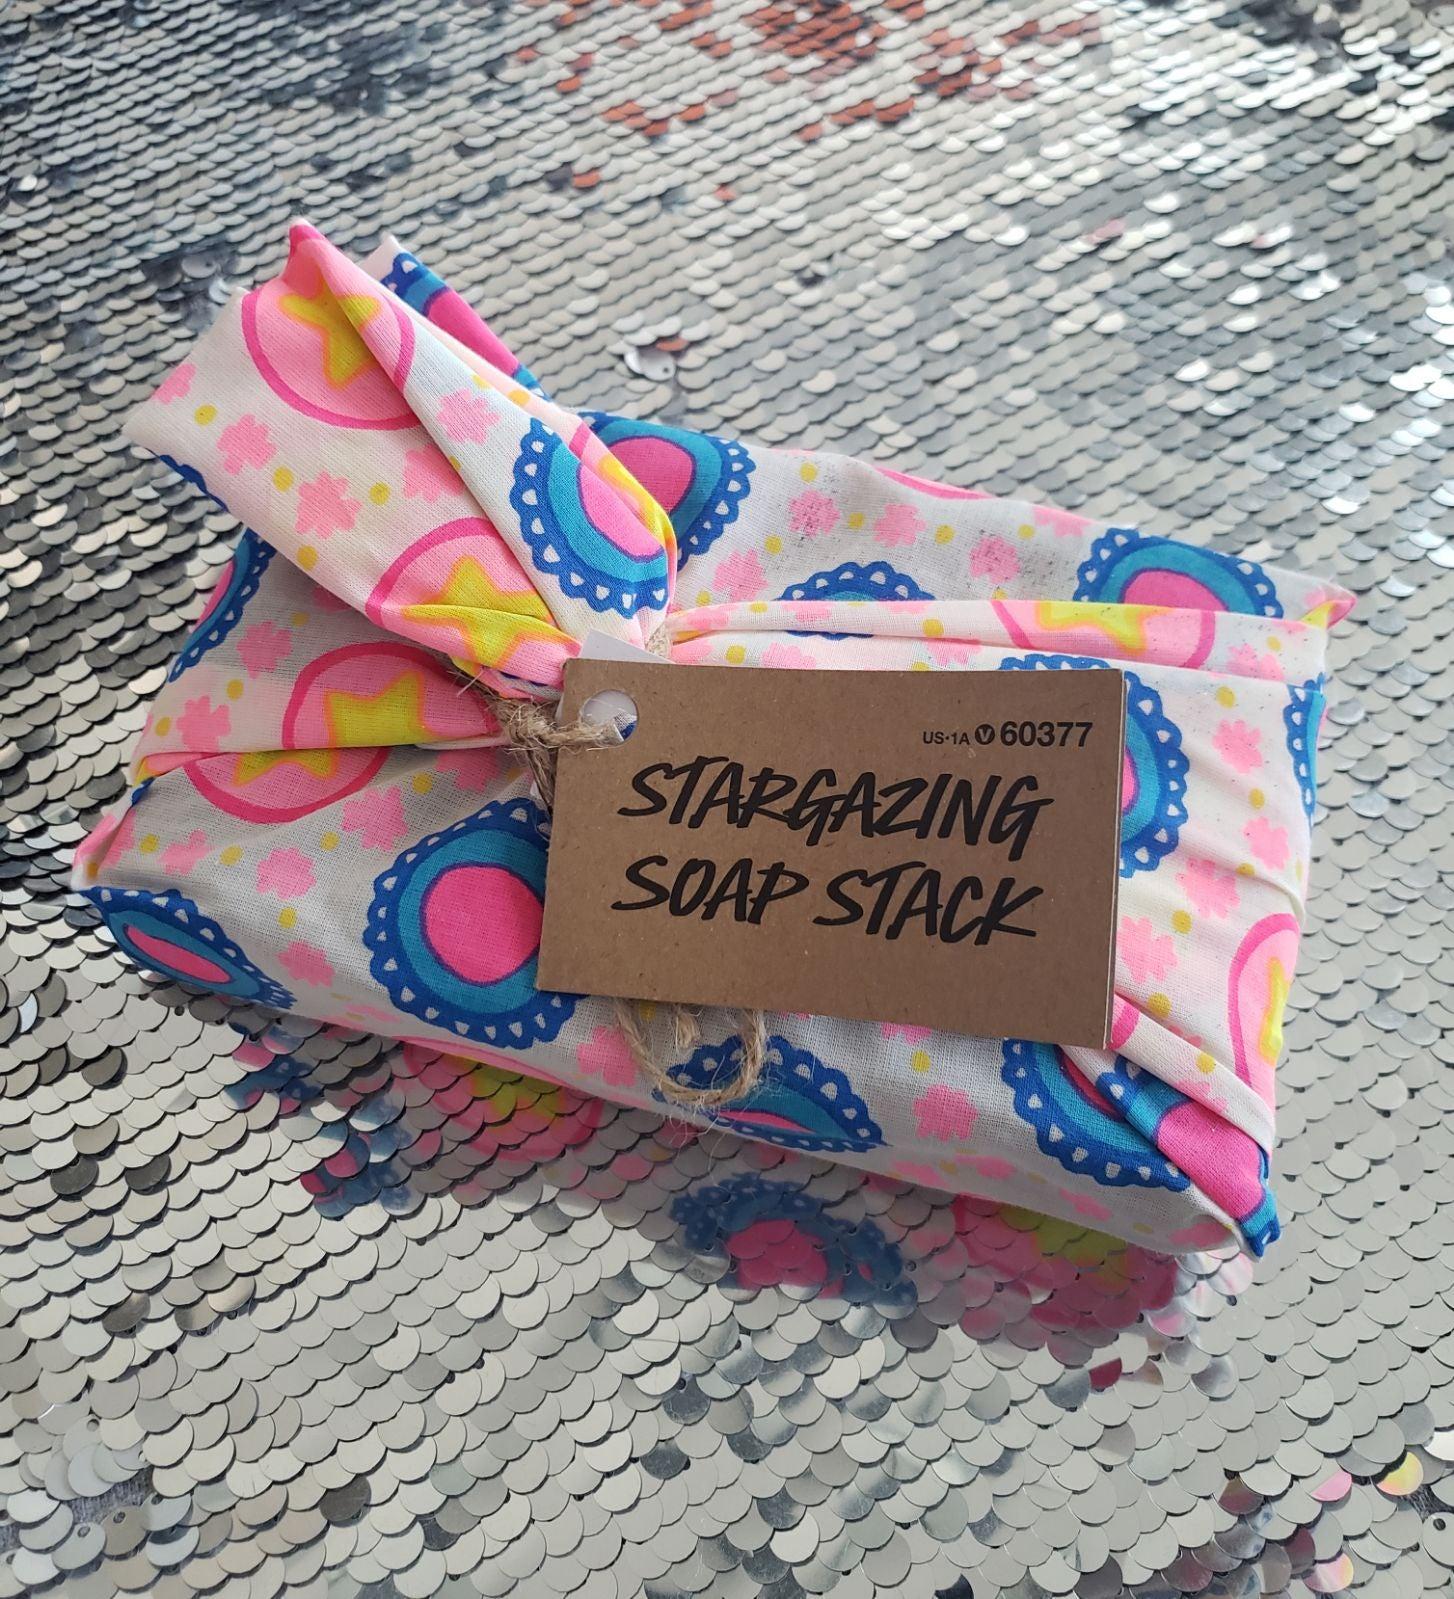 Lush Stargazing Soap Stack